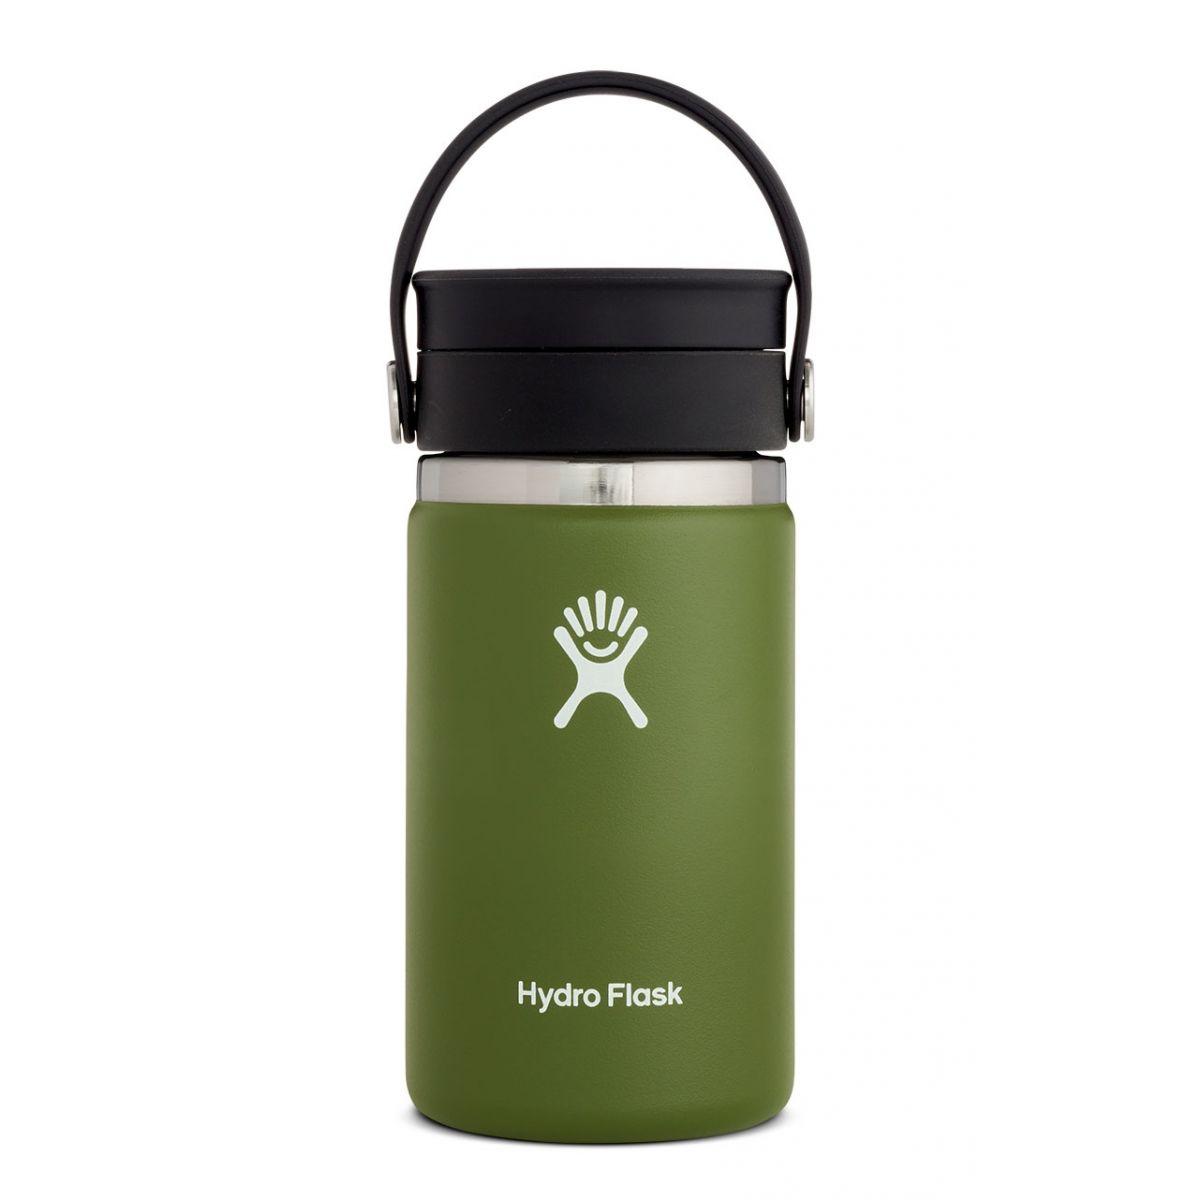 Hydroflask 12 oz kaffekopp olive